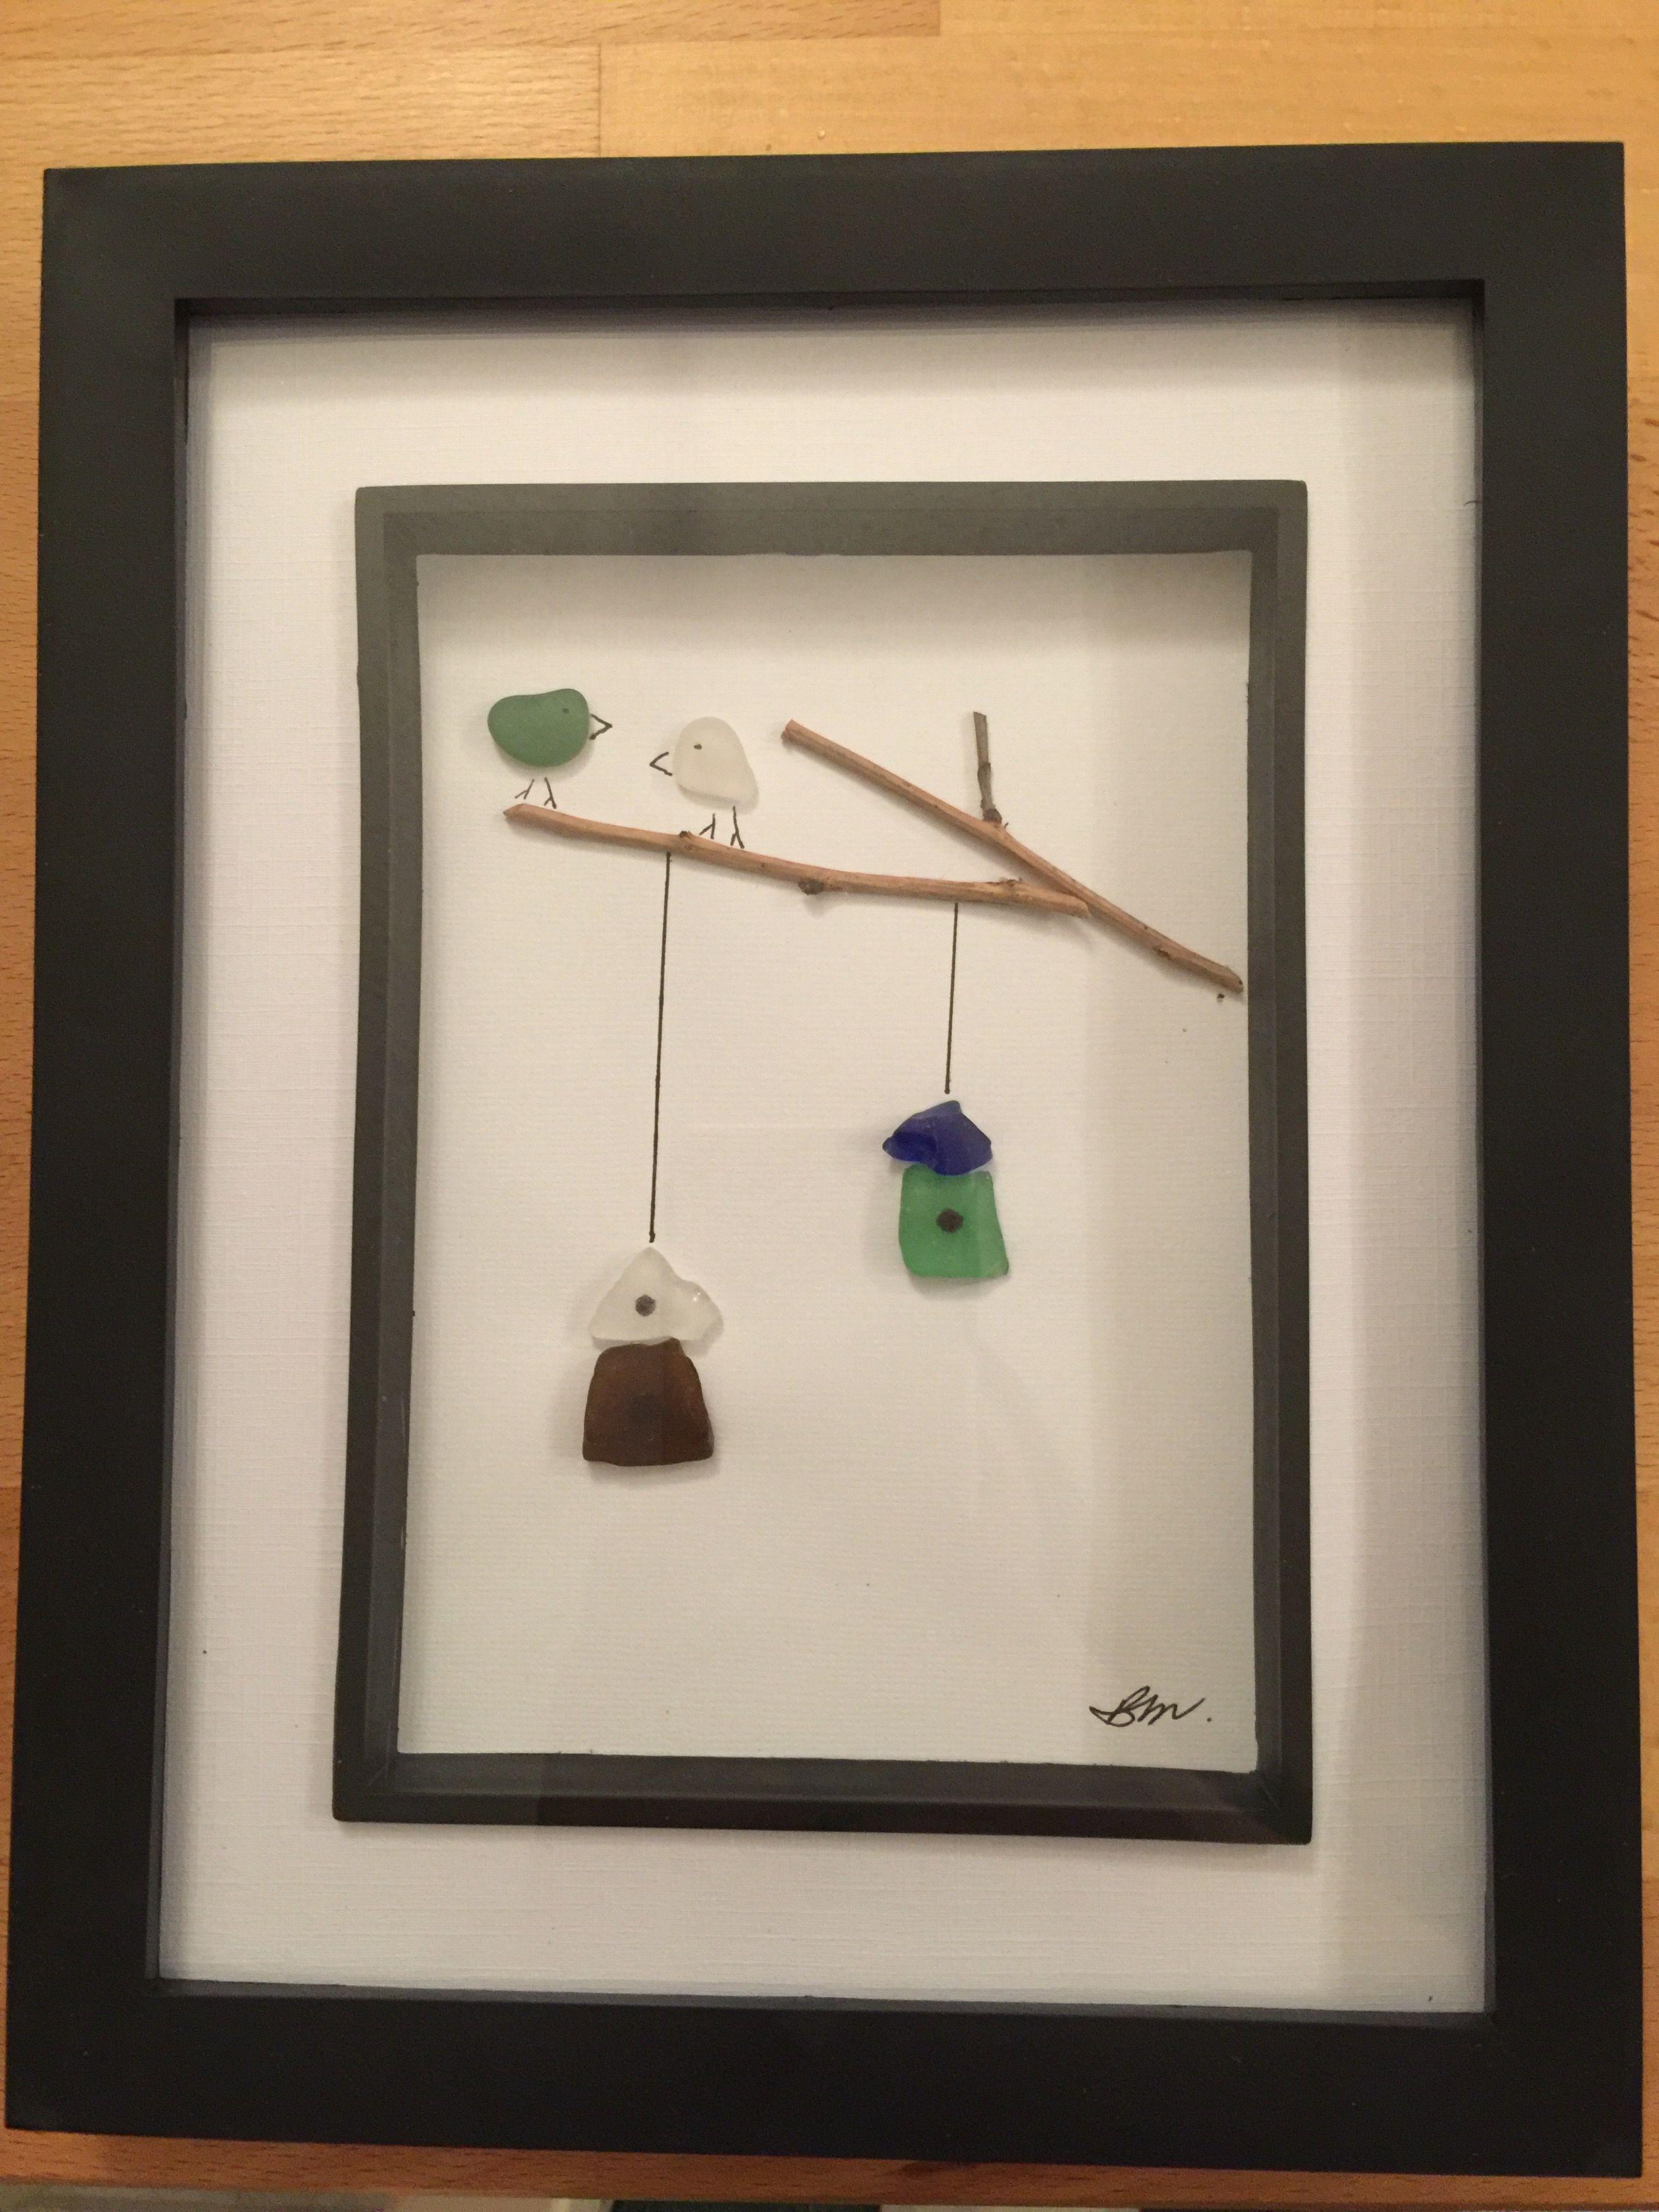 Pin de Ones Comure en Arte de guijarros | Pinterest | Arte de ...